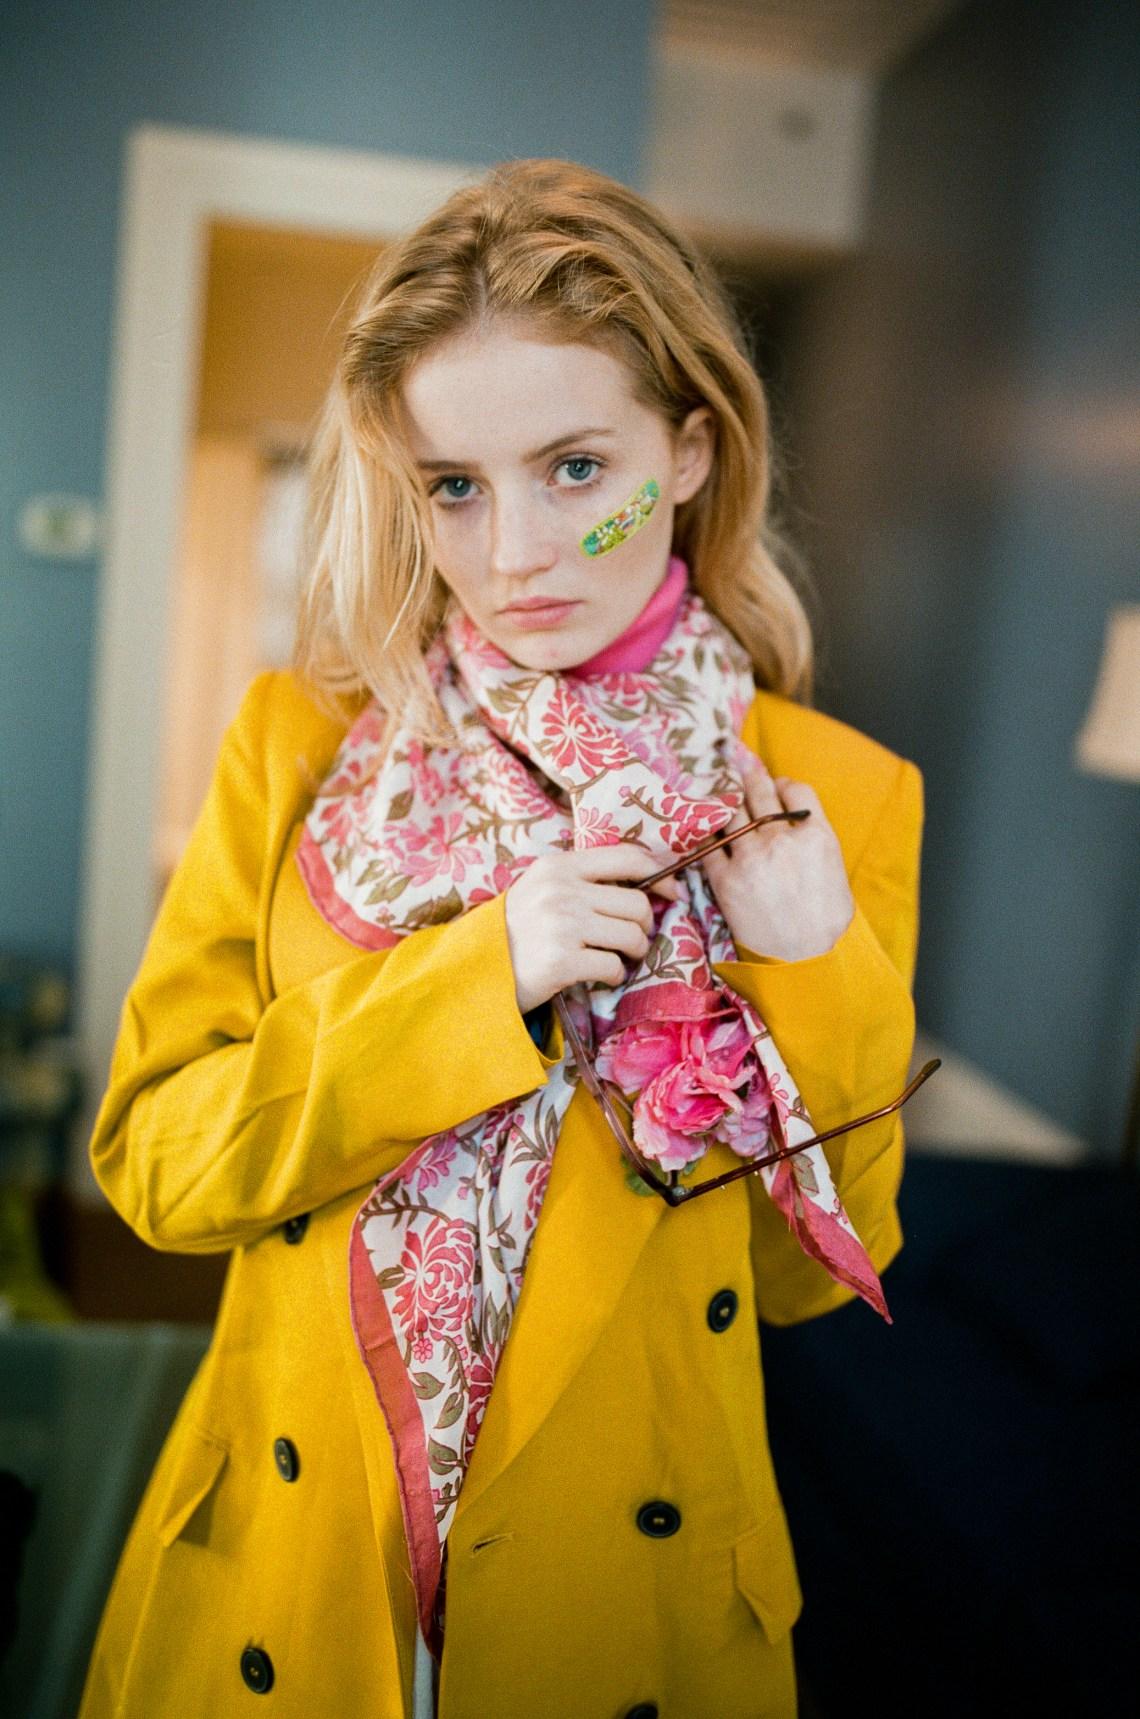 woman adjusting scarf